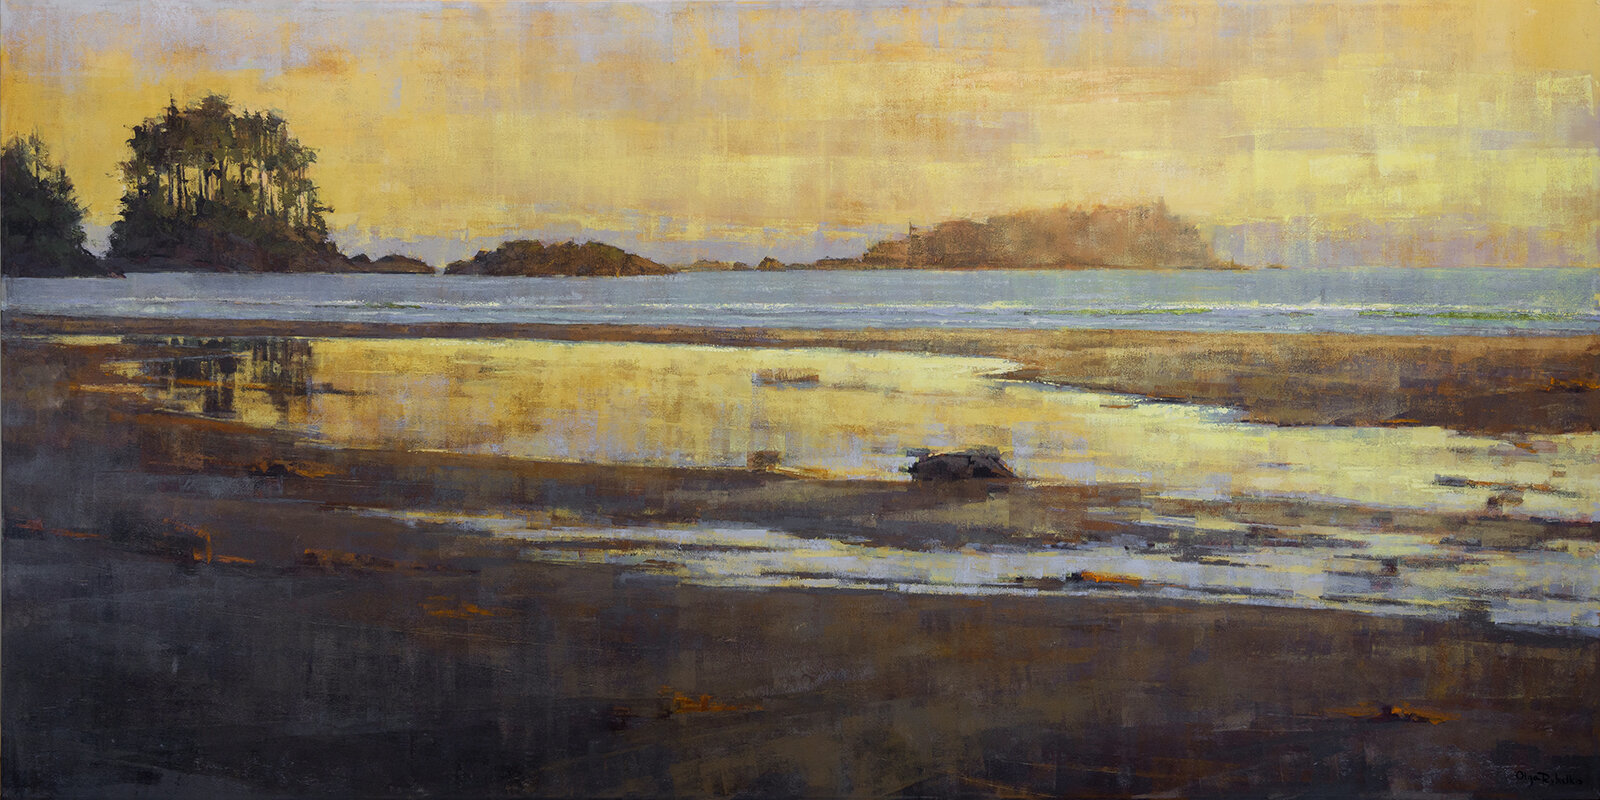 olga+rybalko+art+-+pacific+rim+-+landscape+beach+sunset+painting.jpg